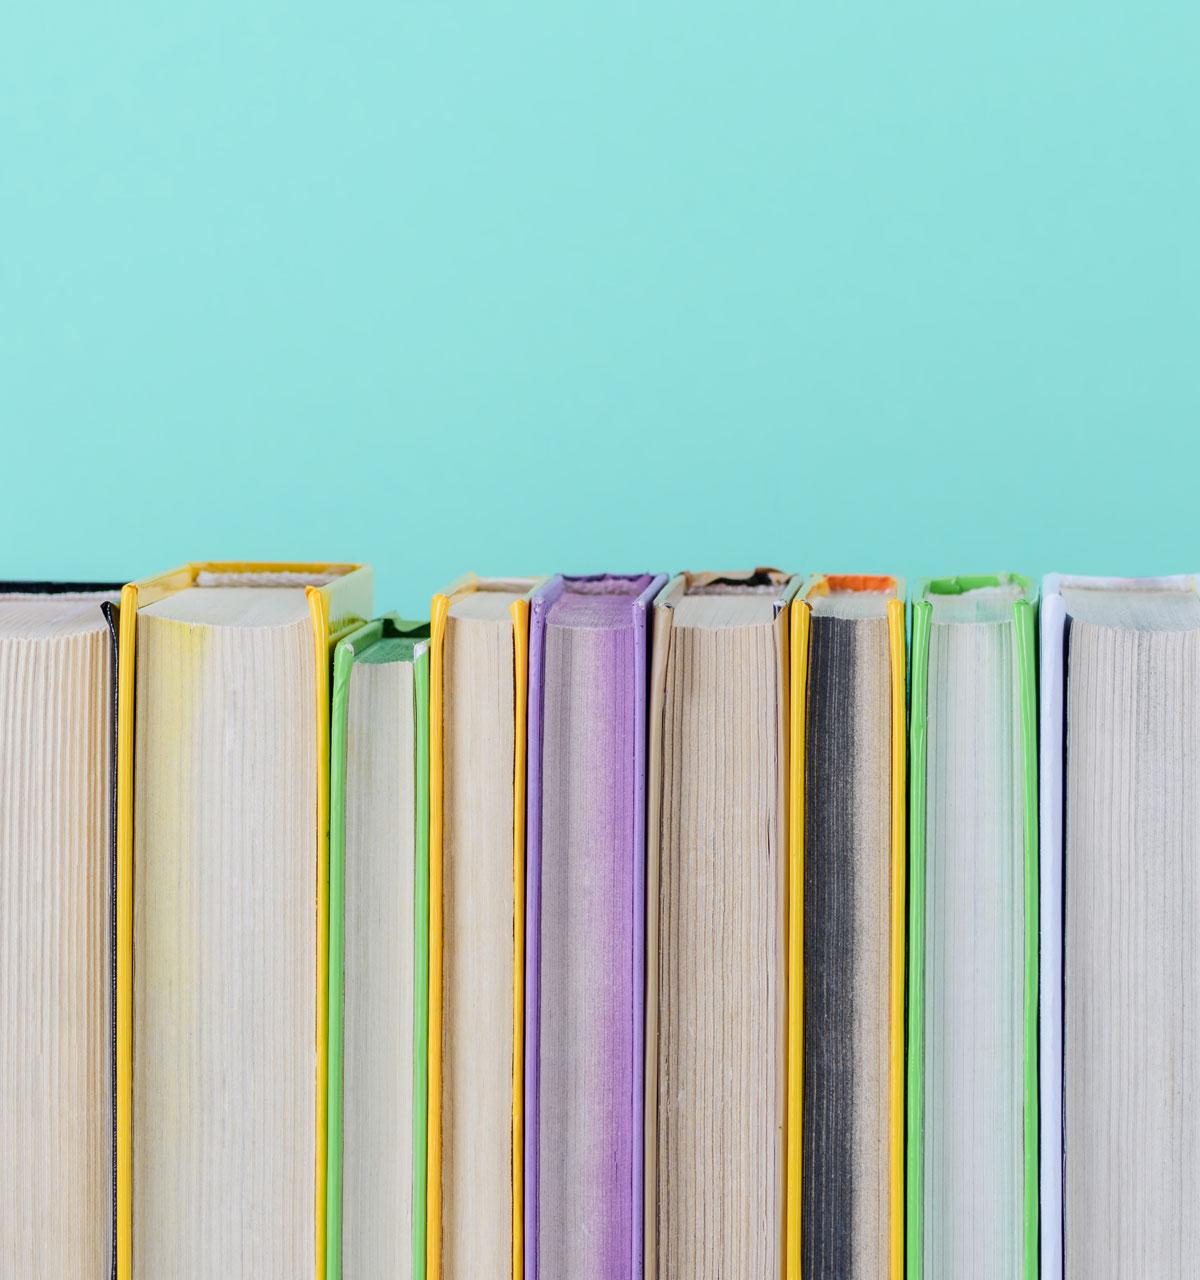 Knjige u redu